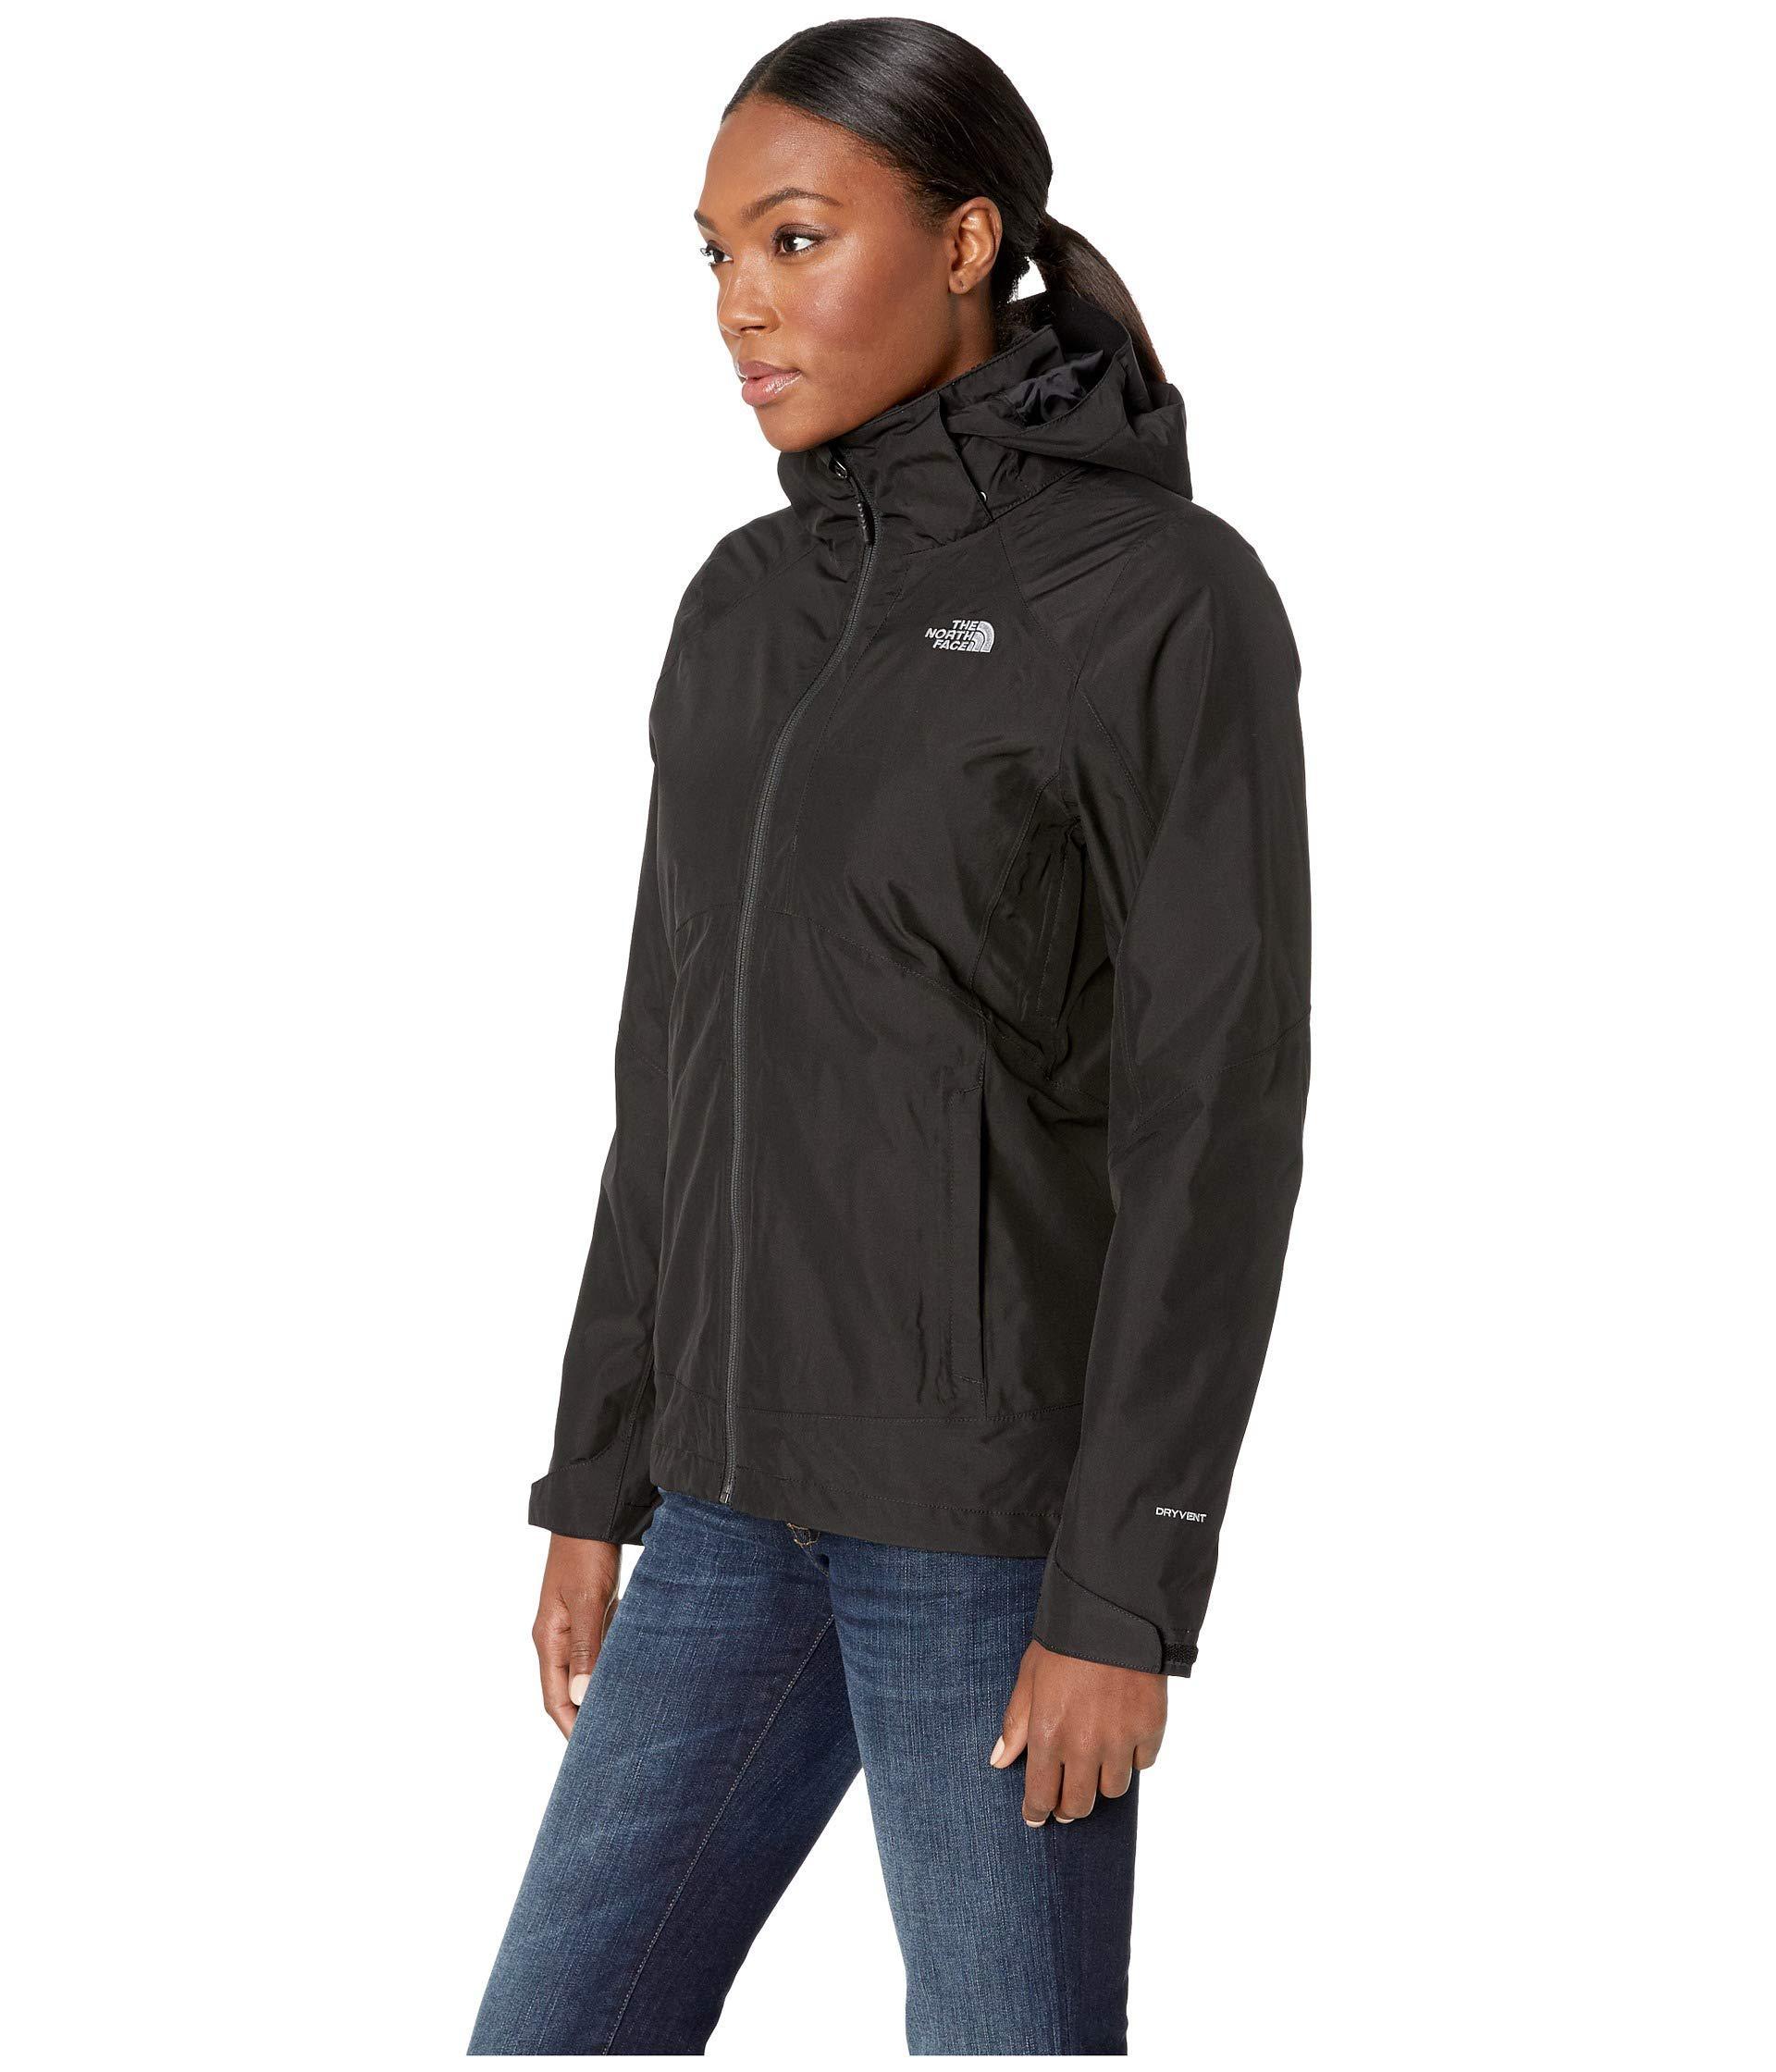 0ab7da708d Lyst - The North Face Osito Triclimate(r) Jacket (tnf Black tnf Black)  Women s Coat in Black